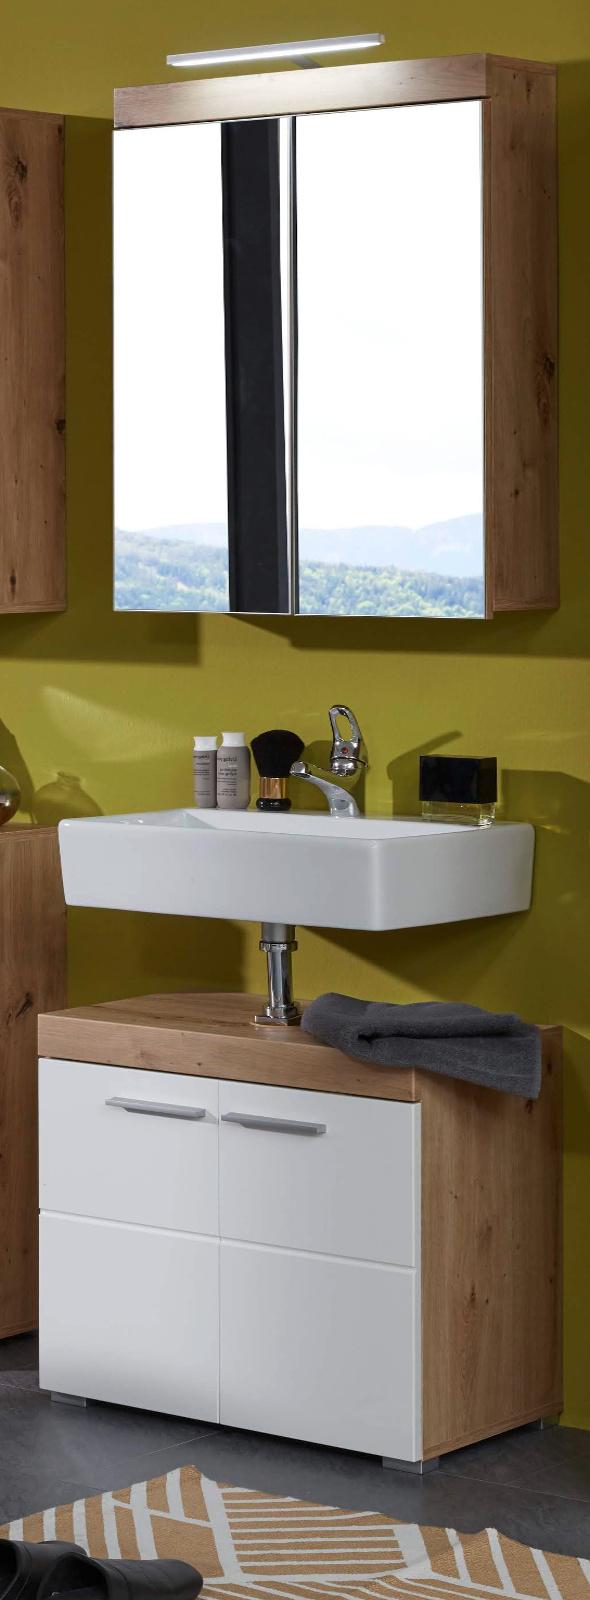 kinderbett jugendbett wei mixxi8 designerm bel moderne m bel owl. Black Bedroom Furniture Sets. Home Design Ideas